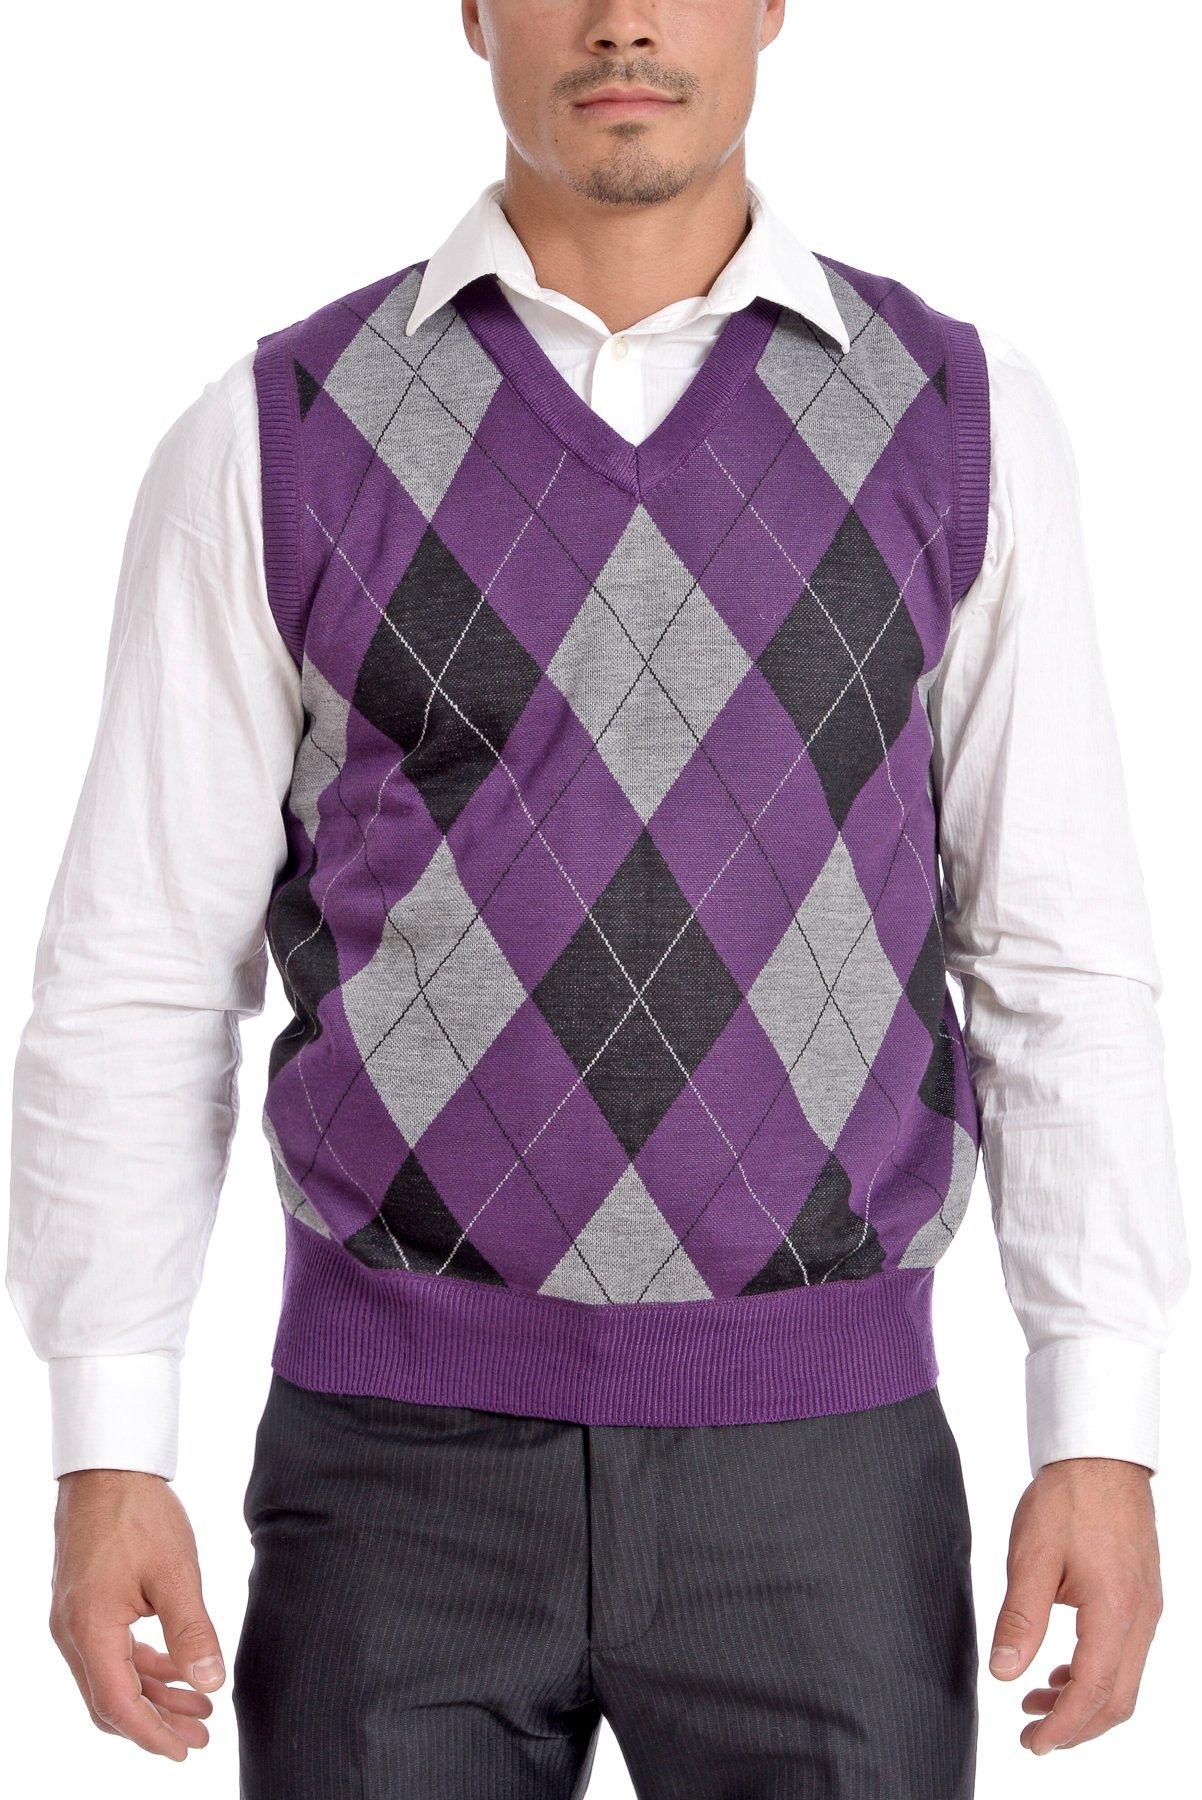 TR Fashion Men's Soft Stretch Argyle V-Neck Casual Pullover Vest (Eggplant, X-Large) by TR Fashion